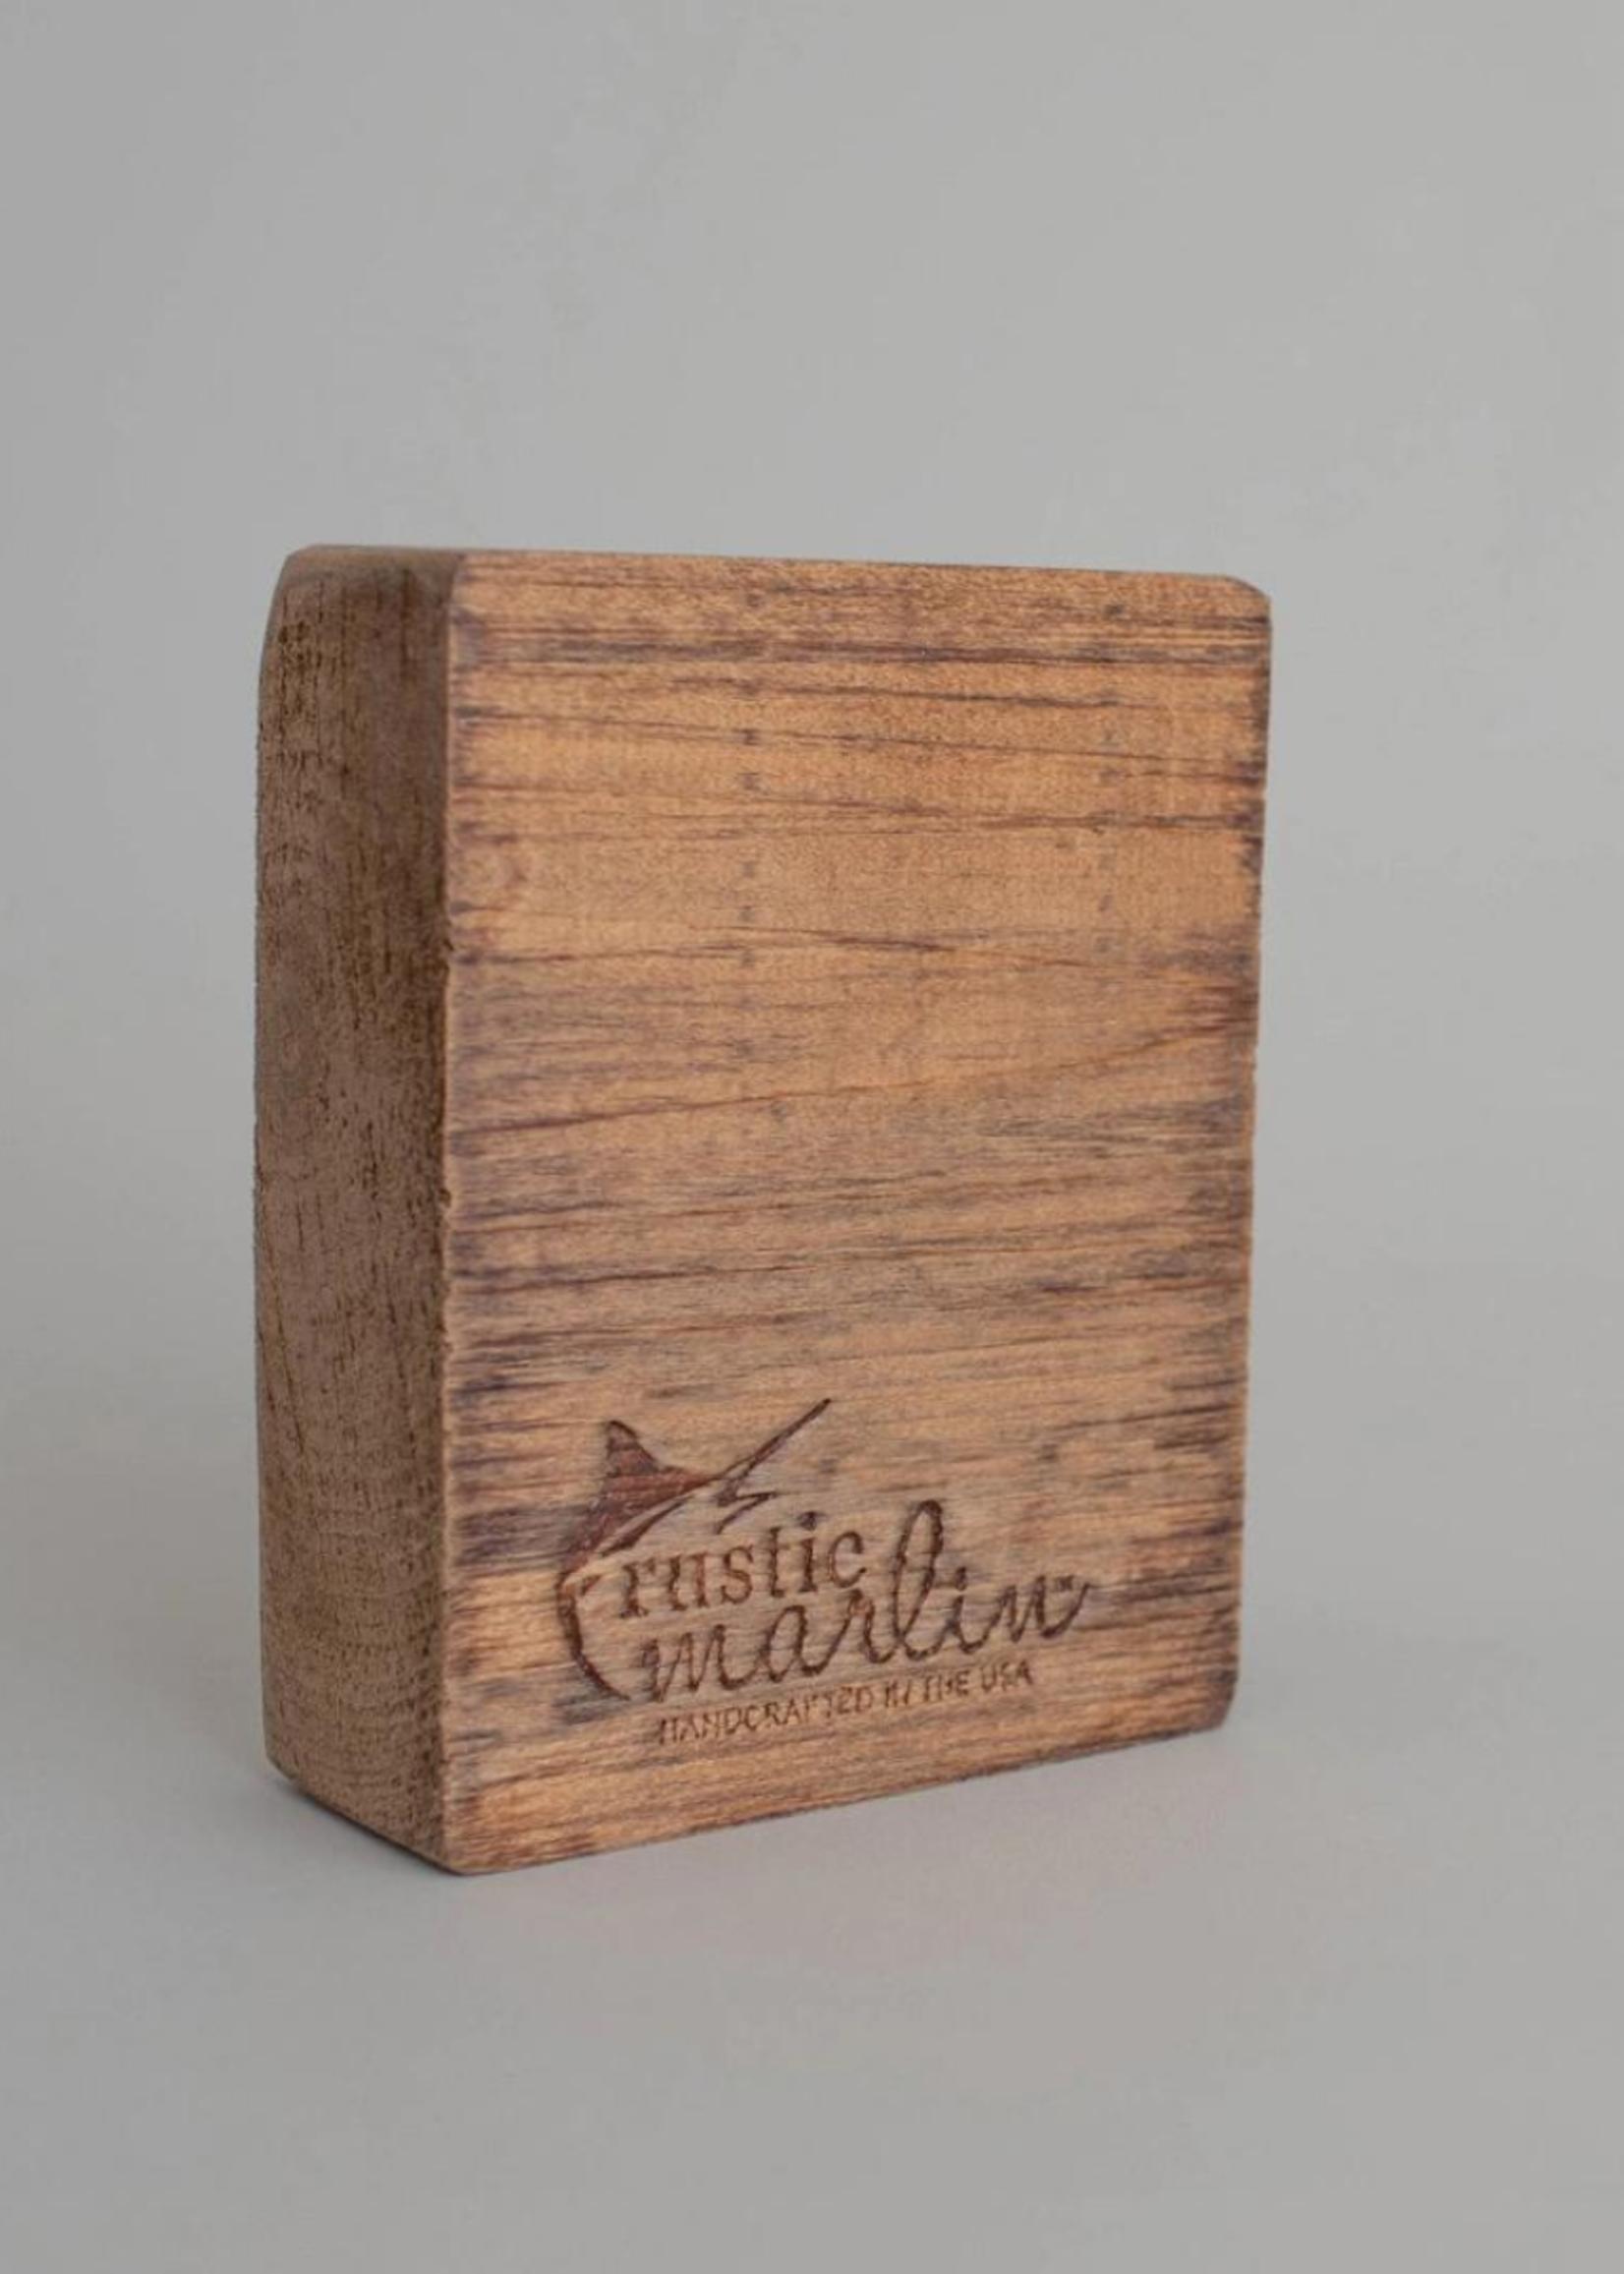 Rustic Marlin Lucky Favorites Wooden Block